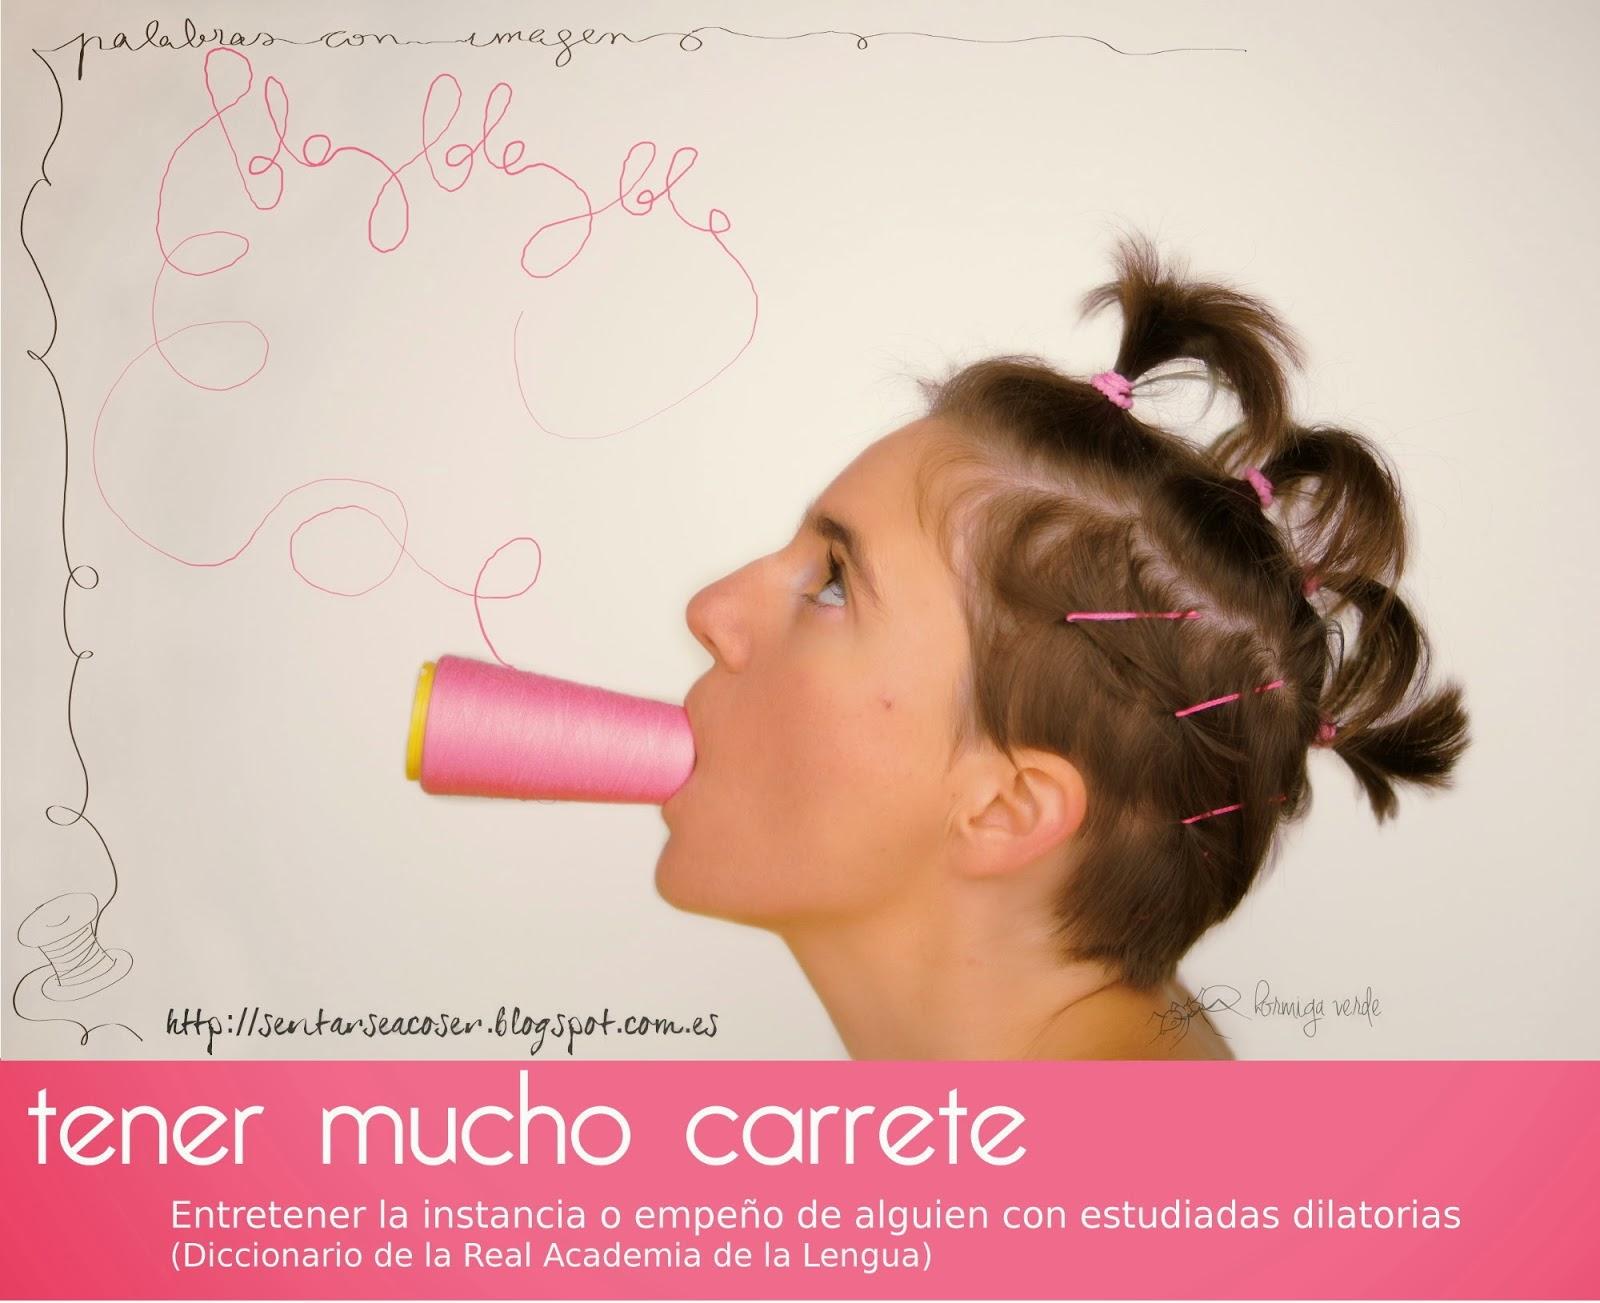 http://sentarseacoser.blogspot.com.es/2013/11/palabras-con-imagen-tener-mucho-carrete.html